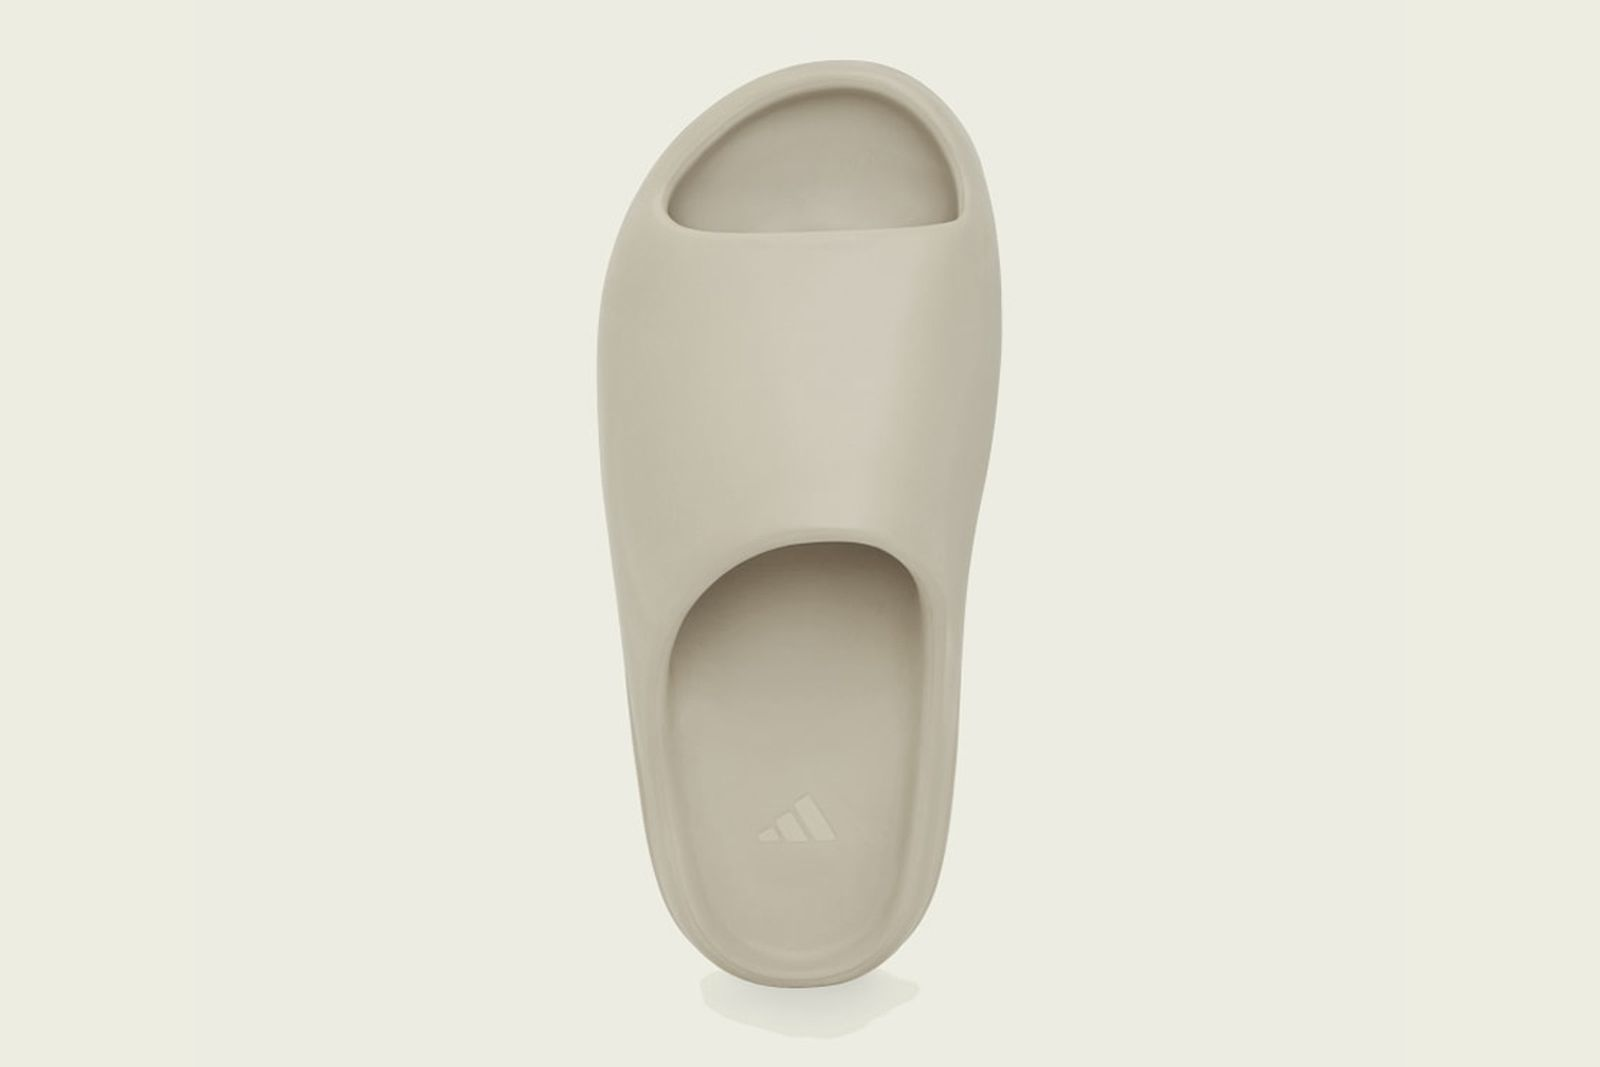 adidas-yeezy-slide-green-glow-release-date-info-price-004